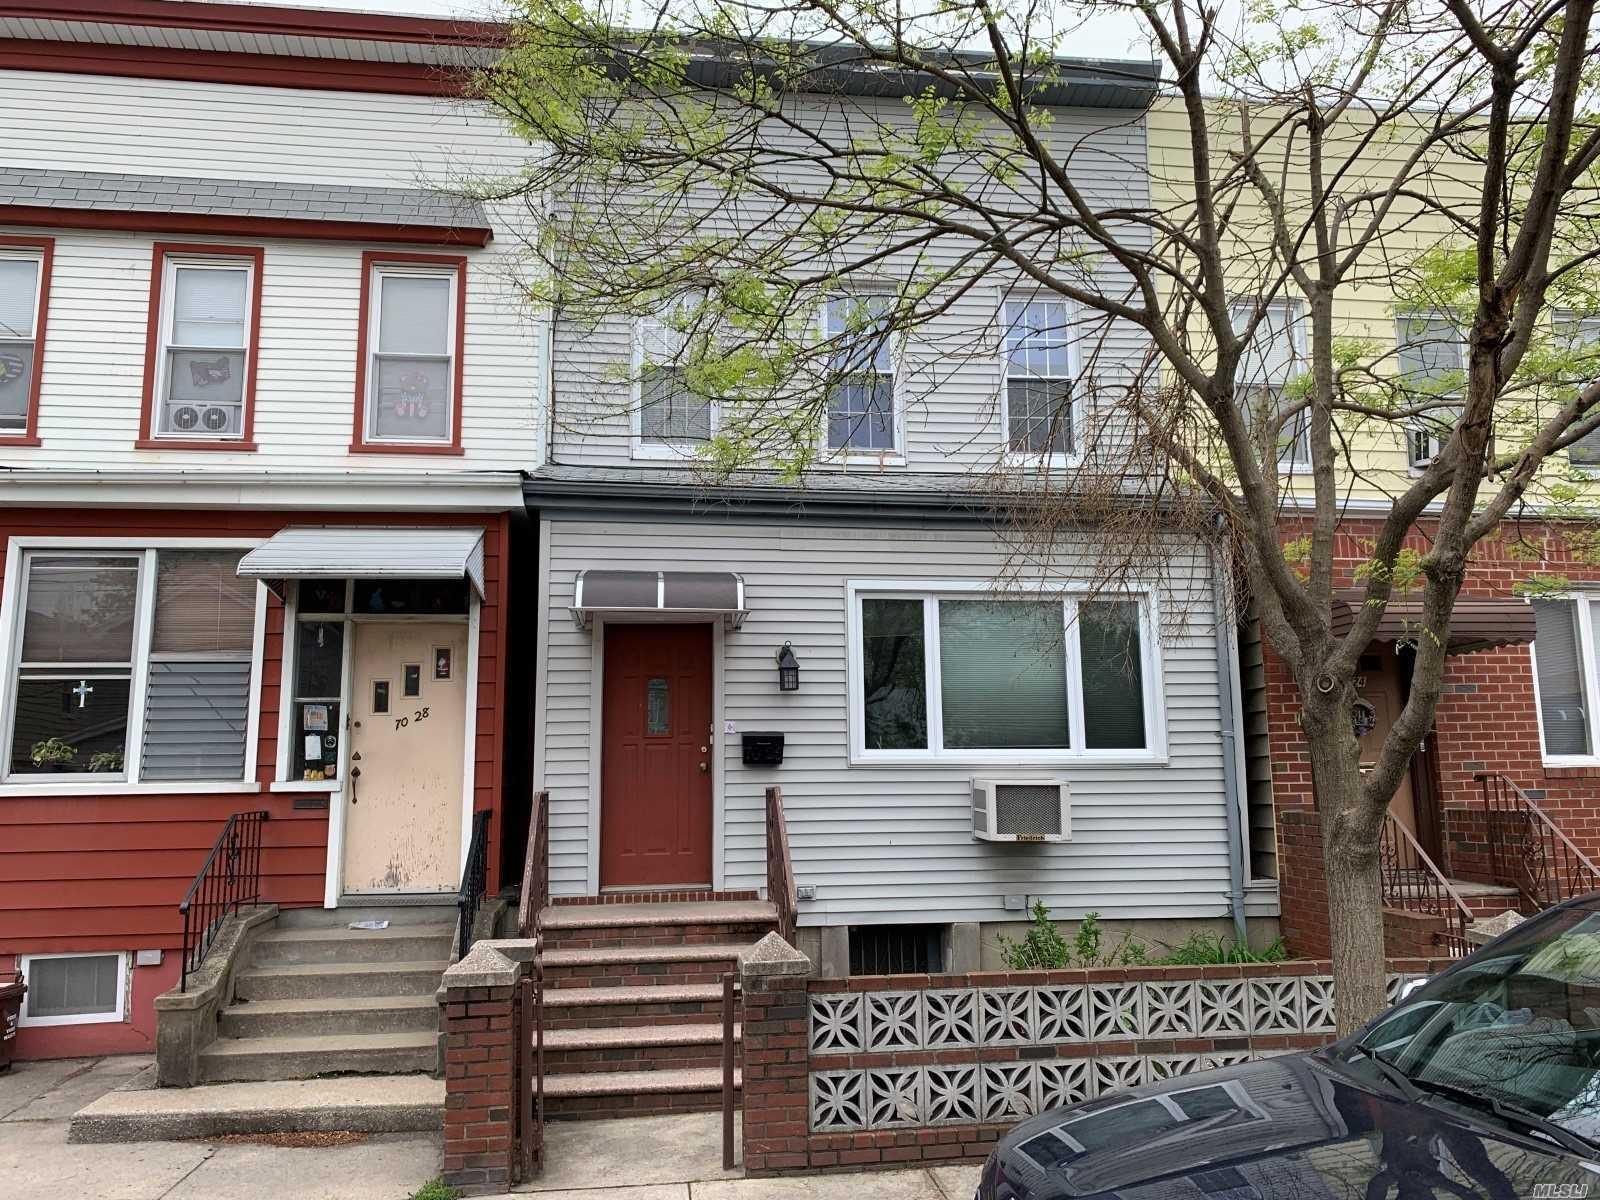 Property for sale at 70-26 71st Place, Glendale NY 11385, Glendale,  New York 11385